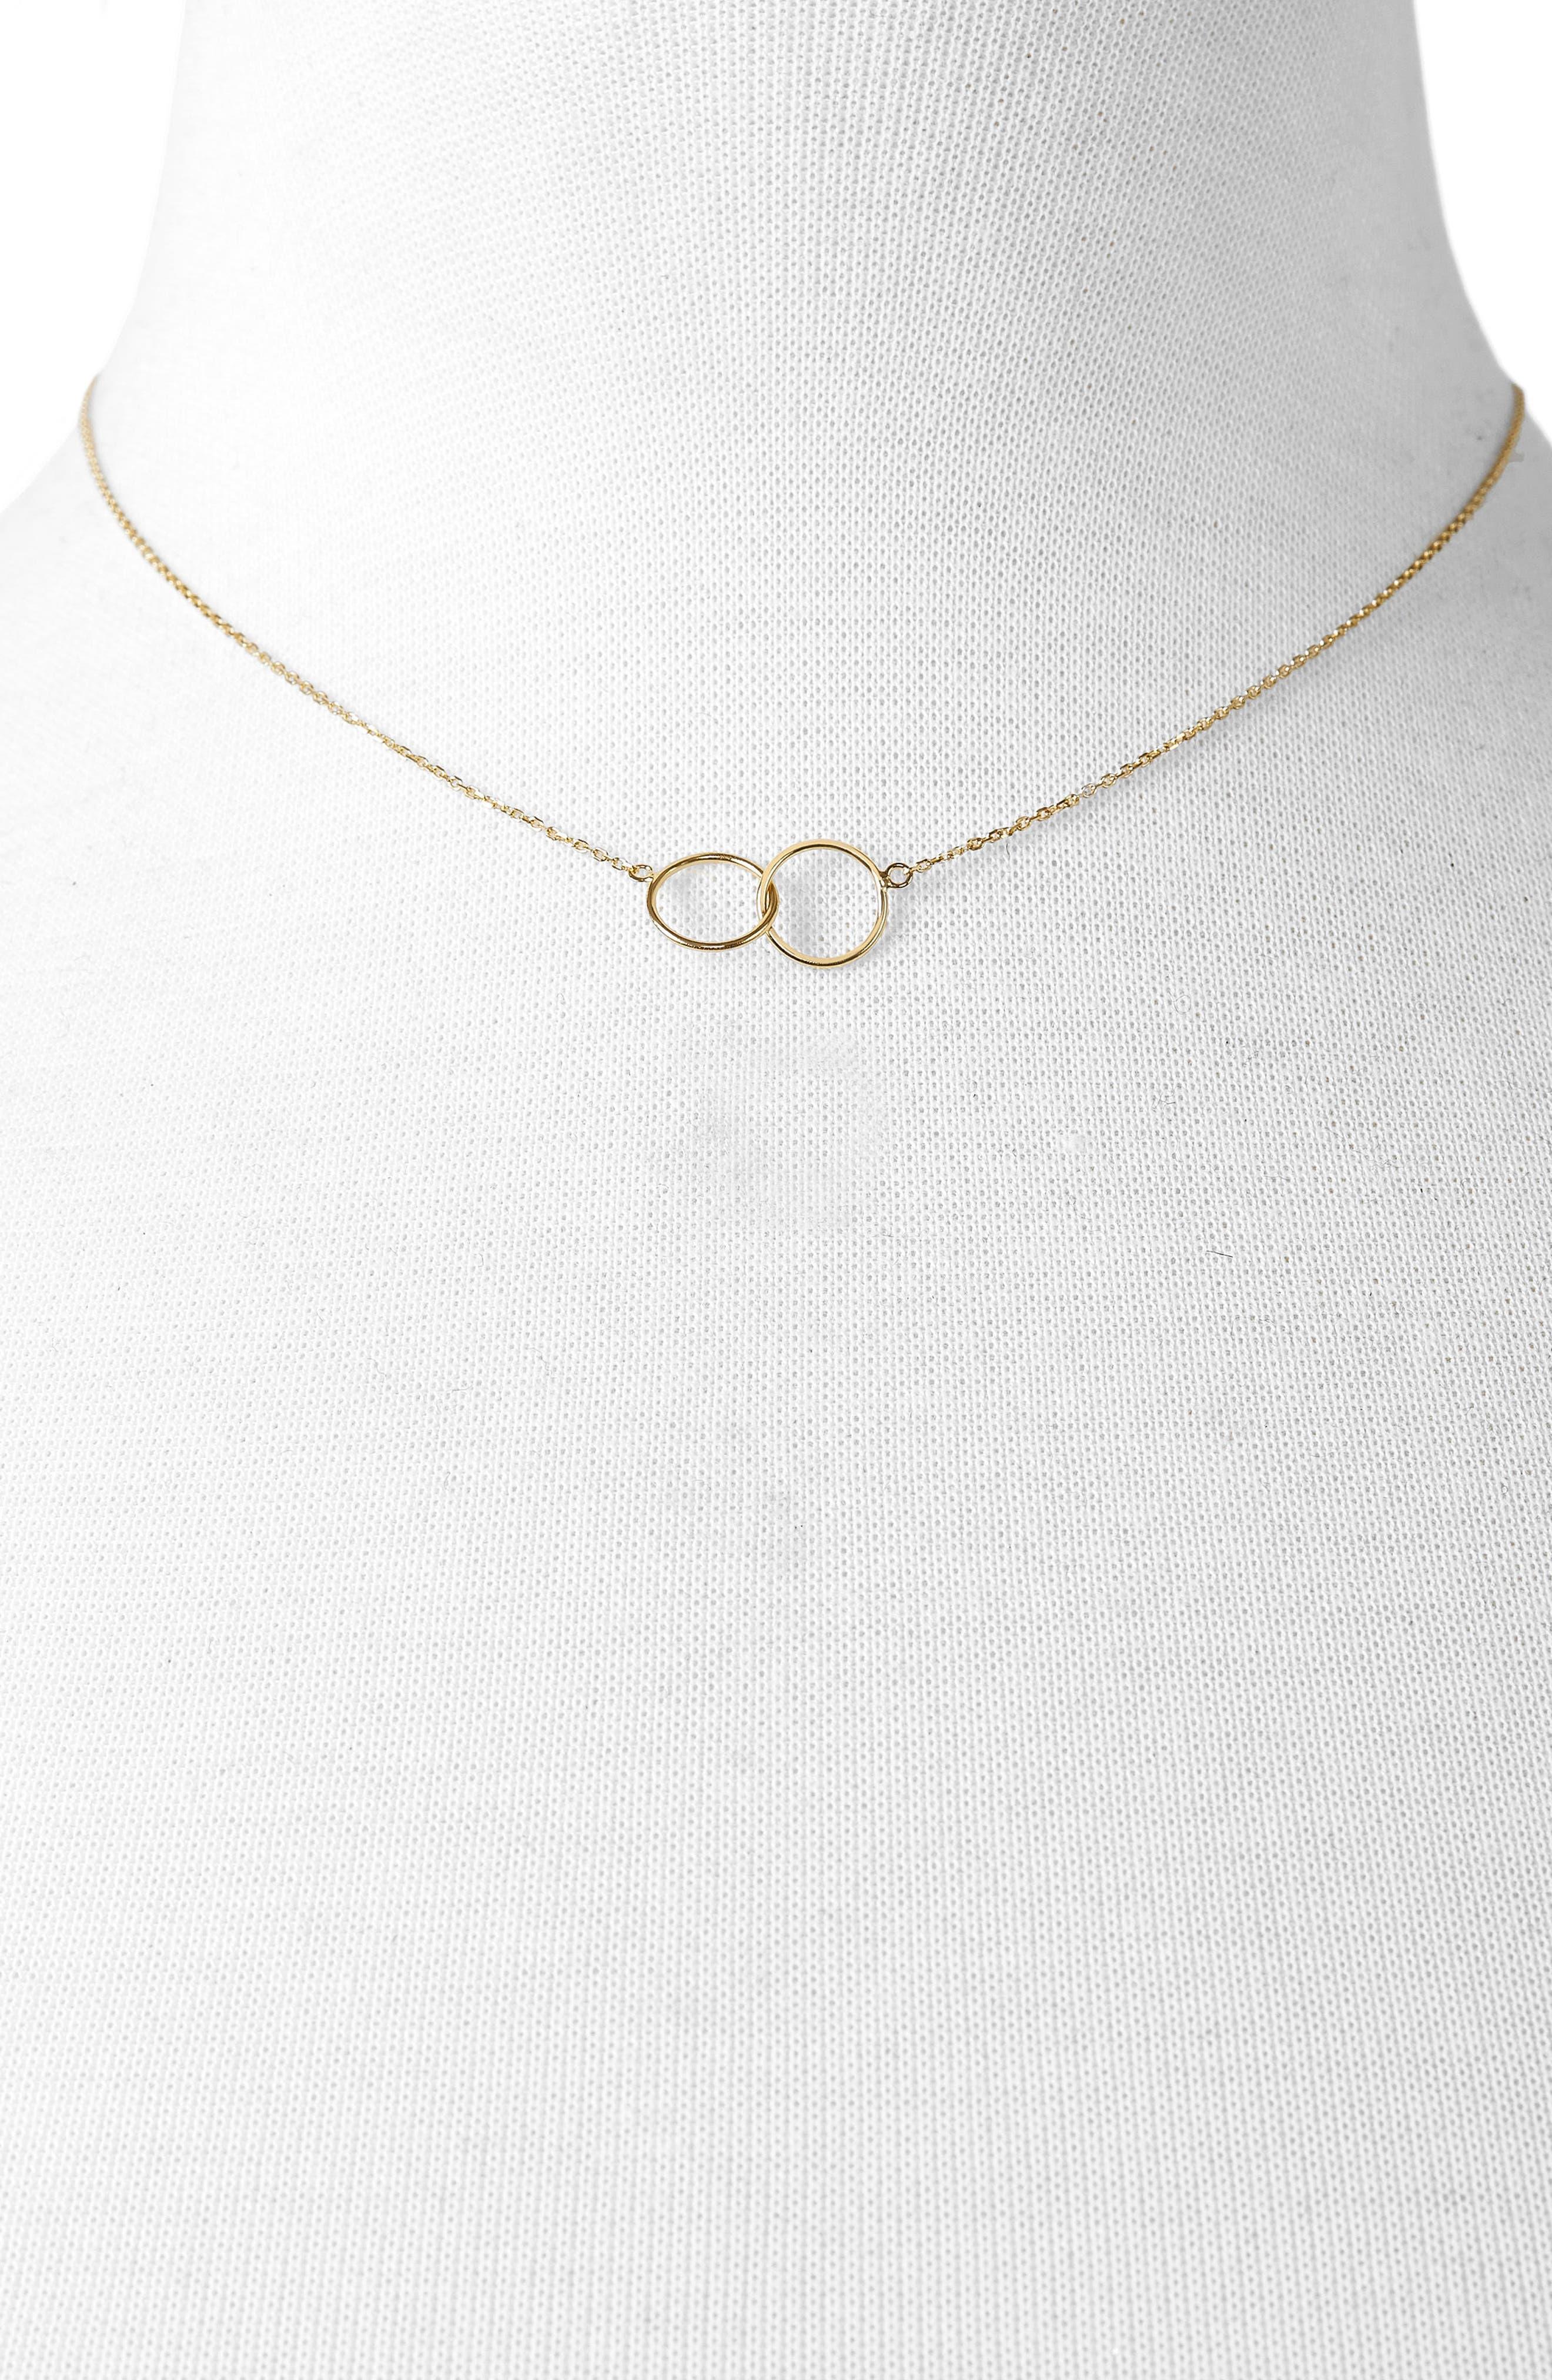 Connesso Everyday Fine Pendant Necklace,                             Alternate thumbnail 2, color,                             717